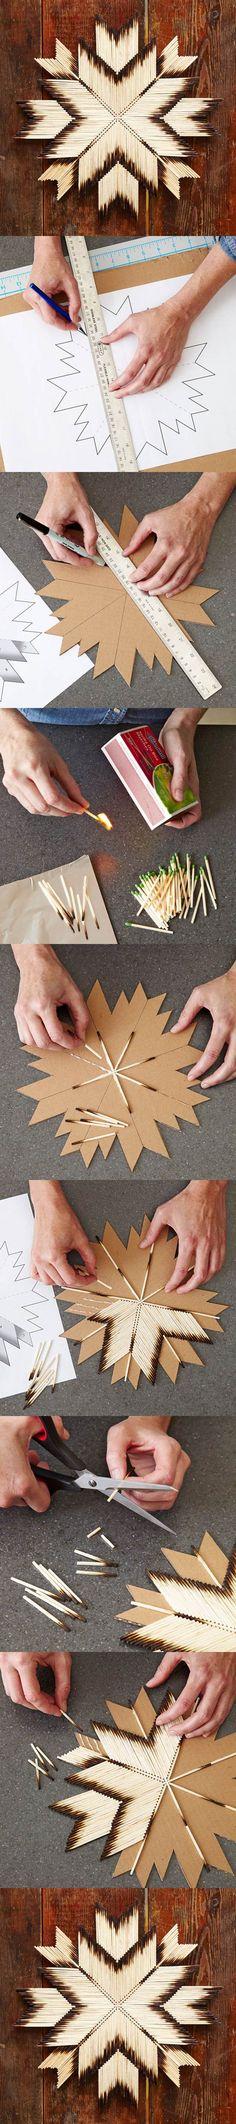 DIY Unique Crafts of Matches iCreativeIdeas.com Like Us on Facebook ==> https://www.facebook.com/icreativeideas